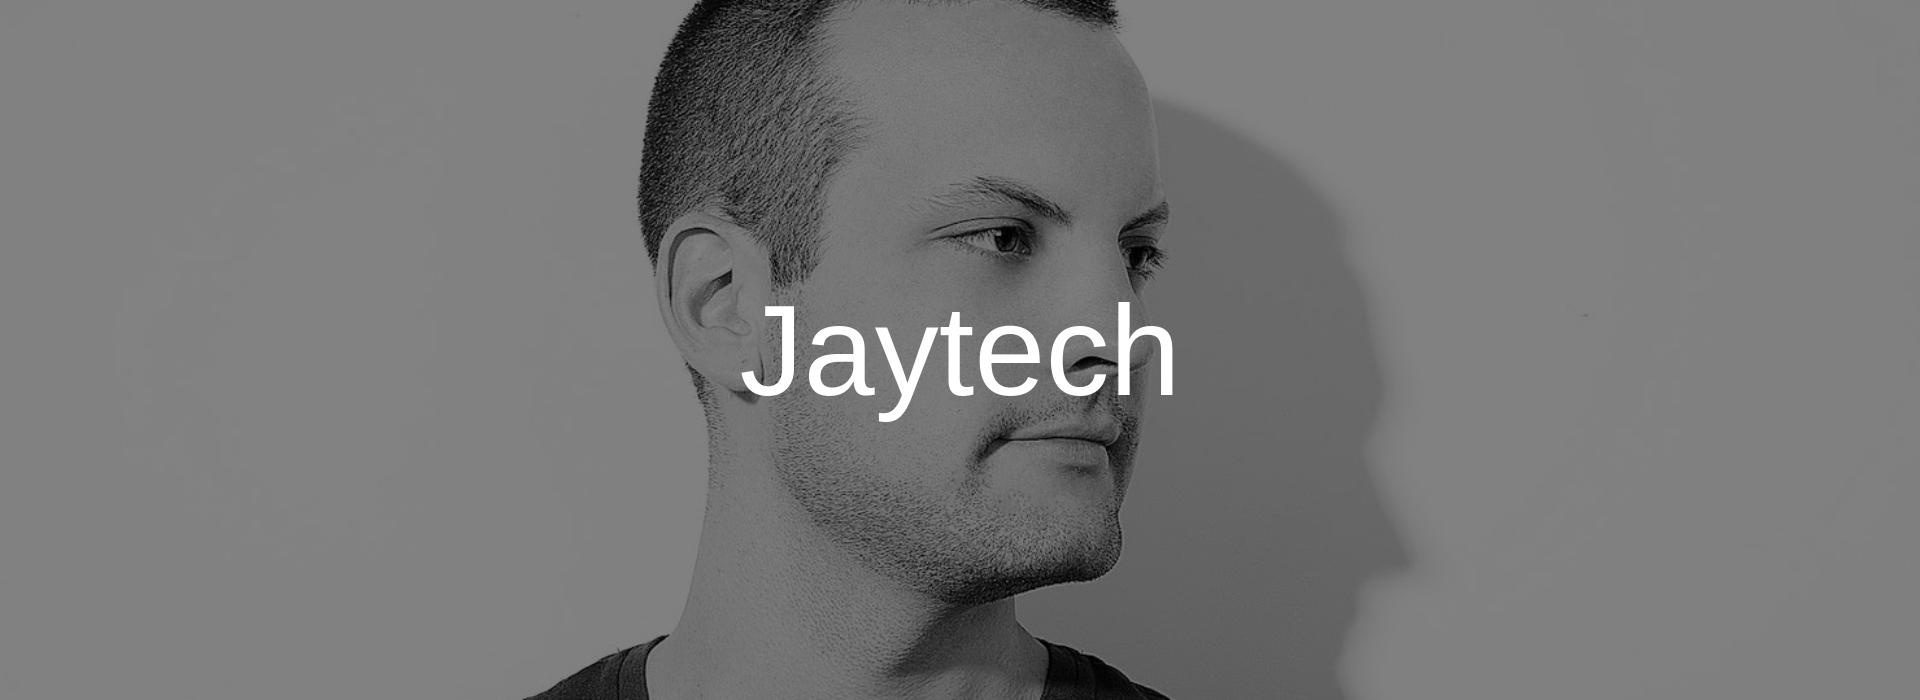 Jaytech - Pyramind